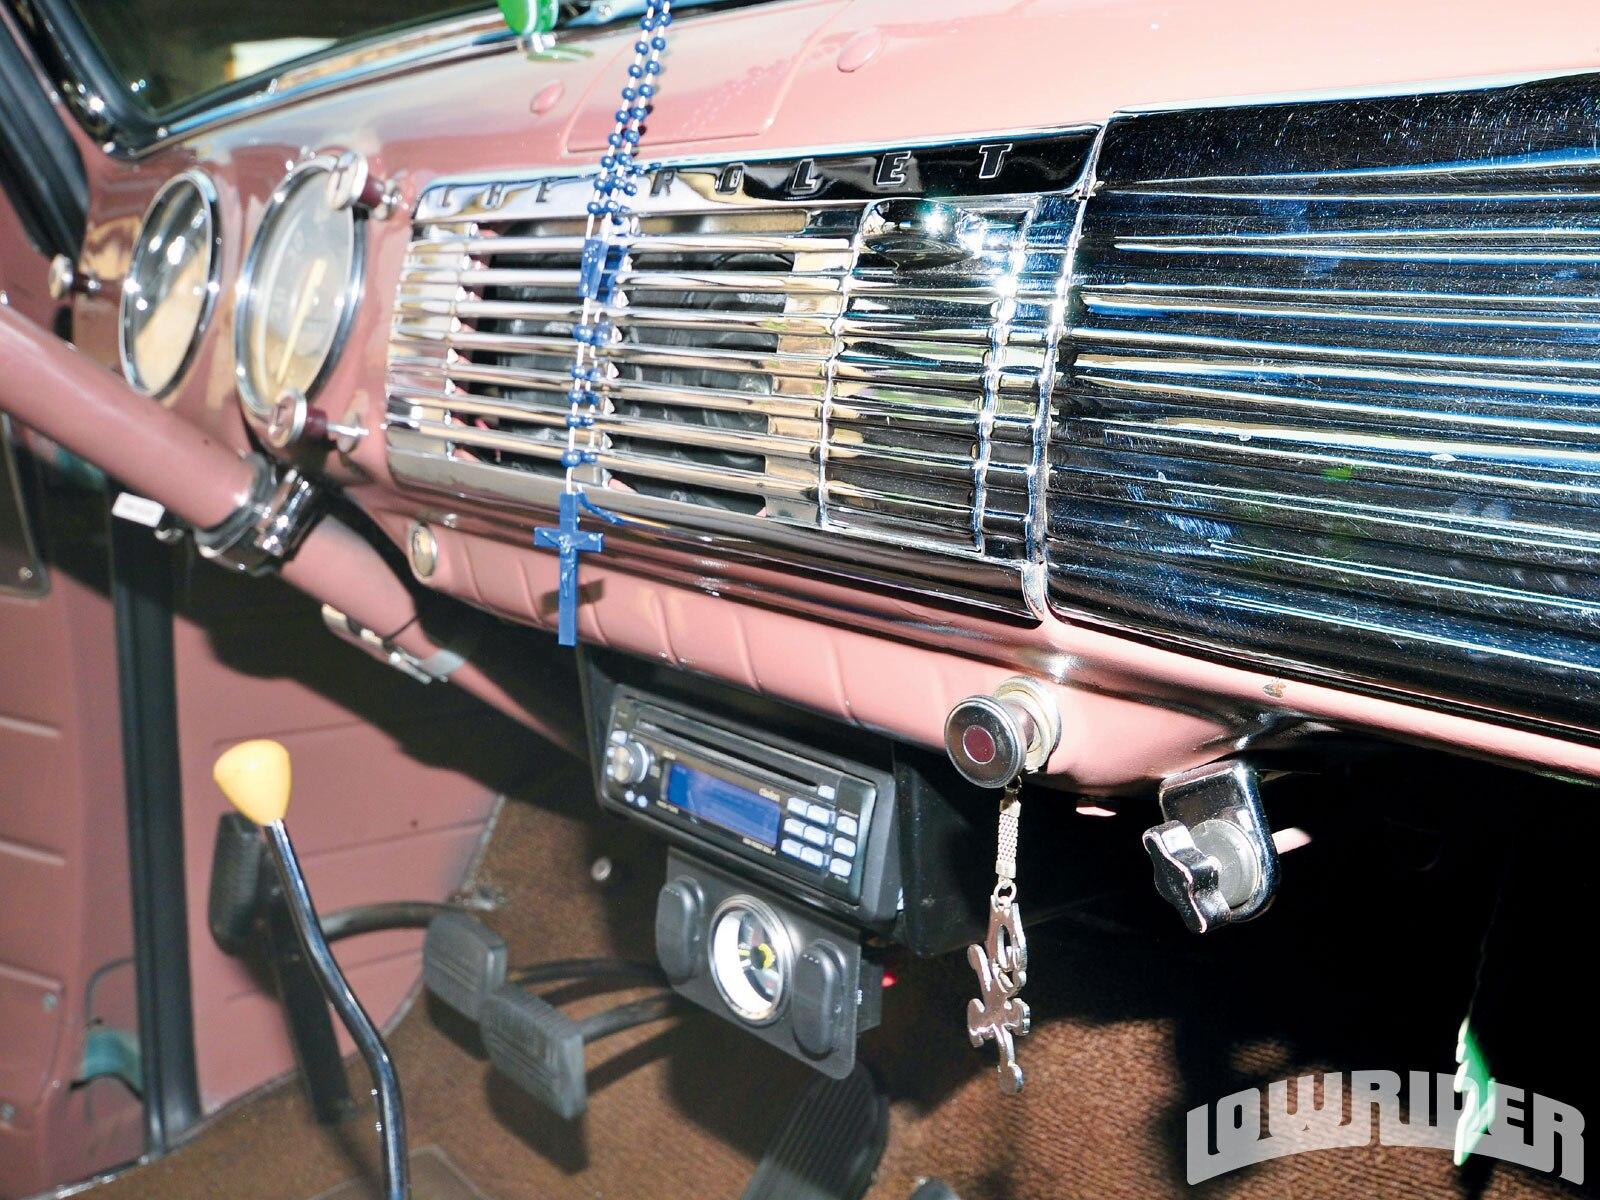 1952 Chevrolet Truck - Lowrider Magazine